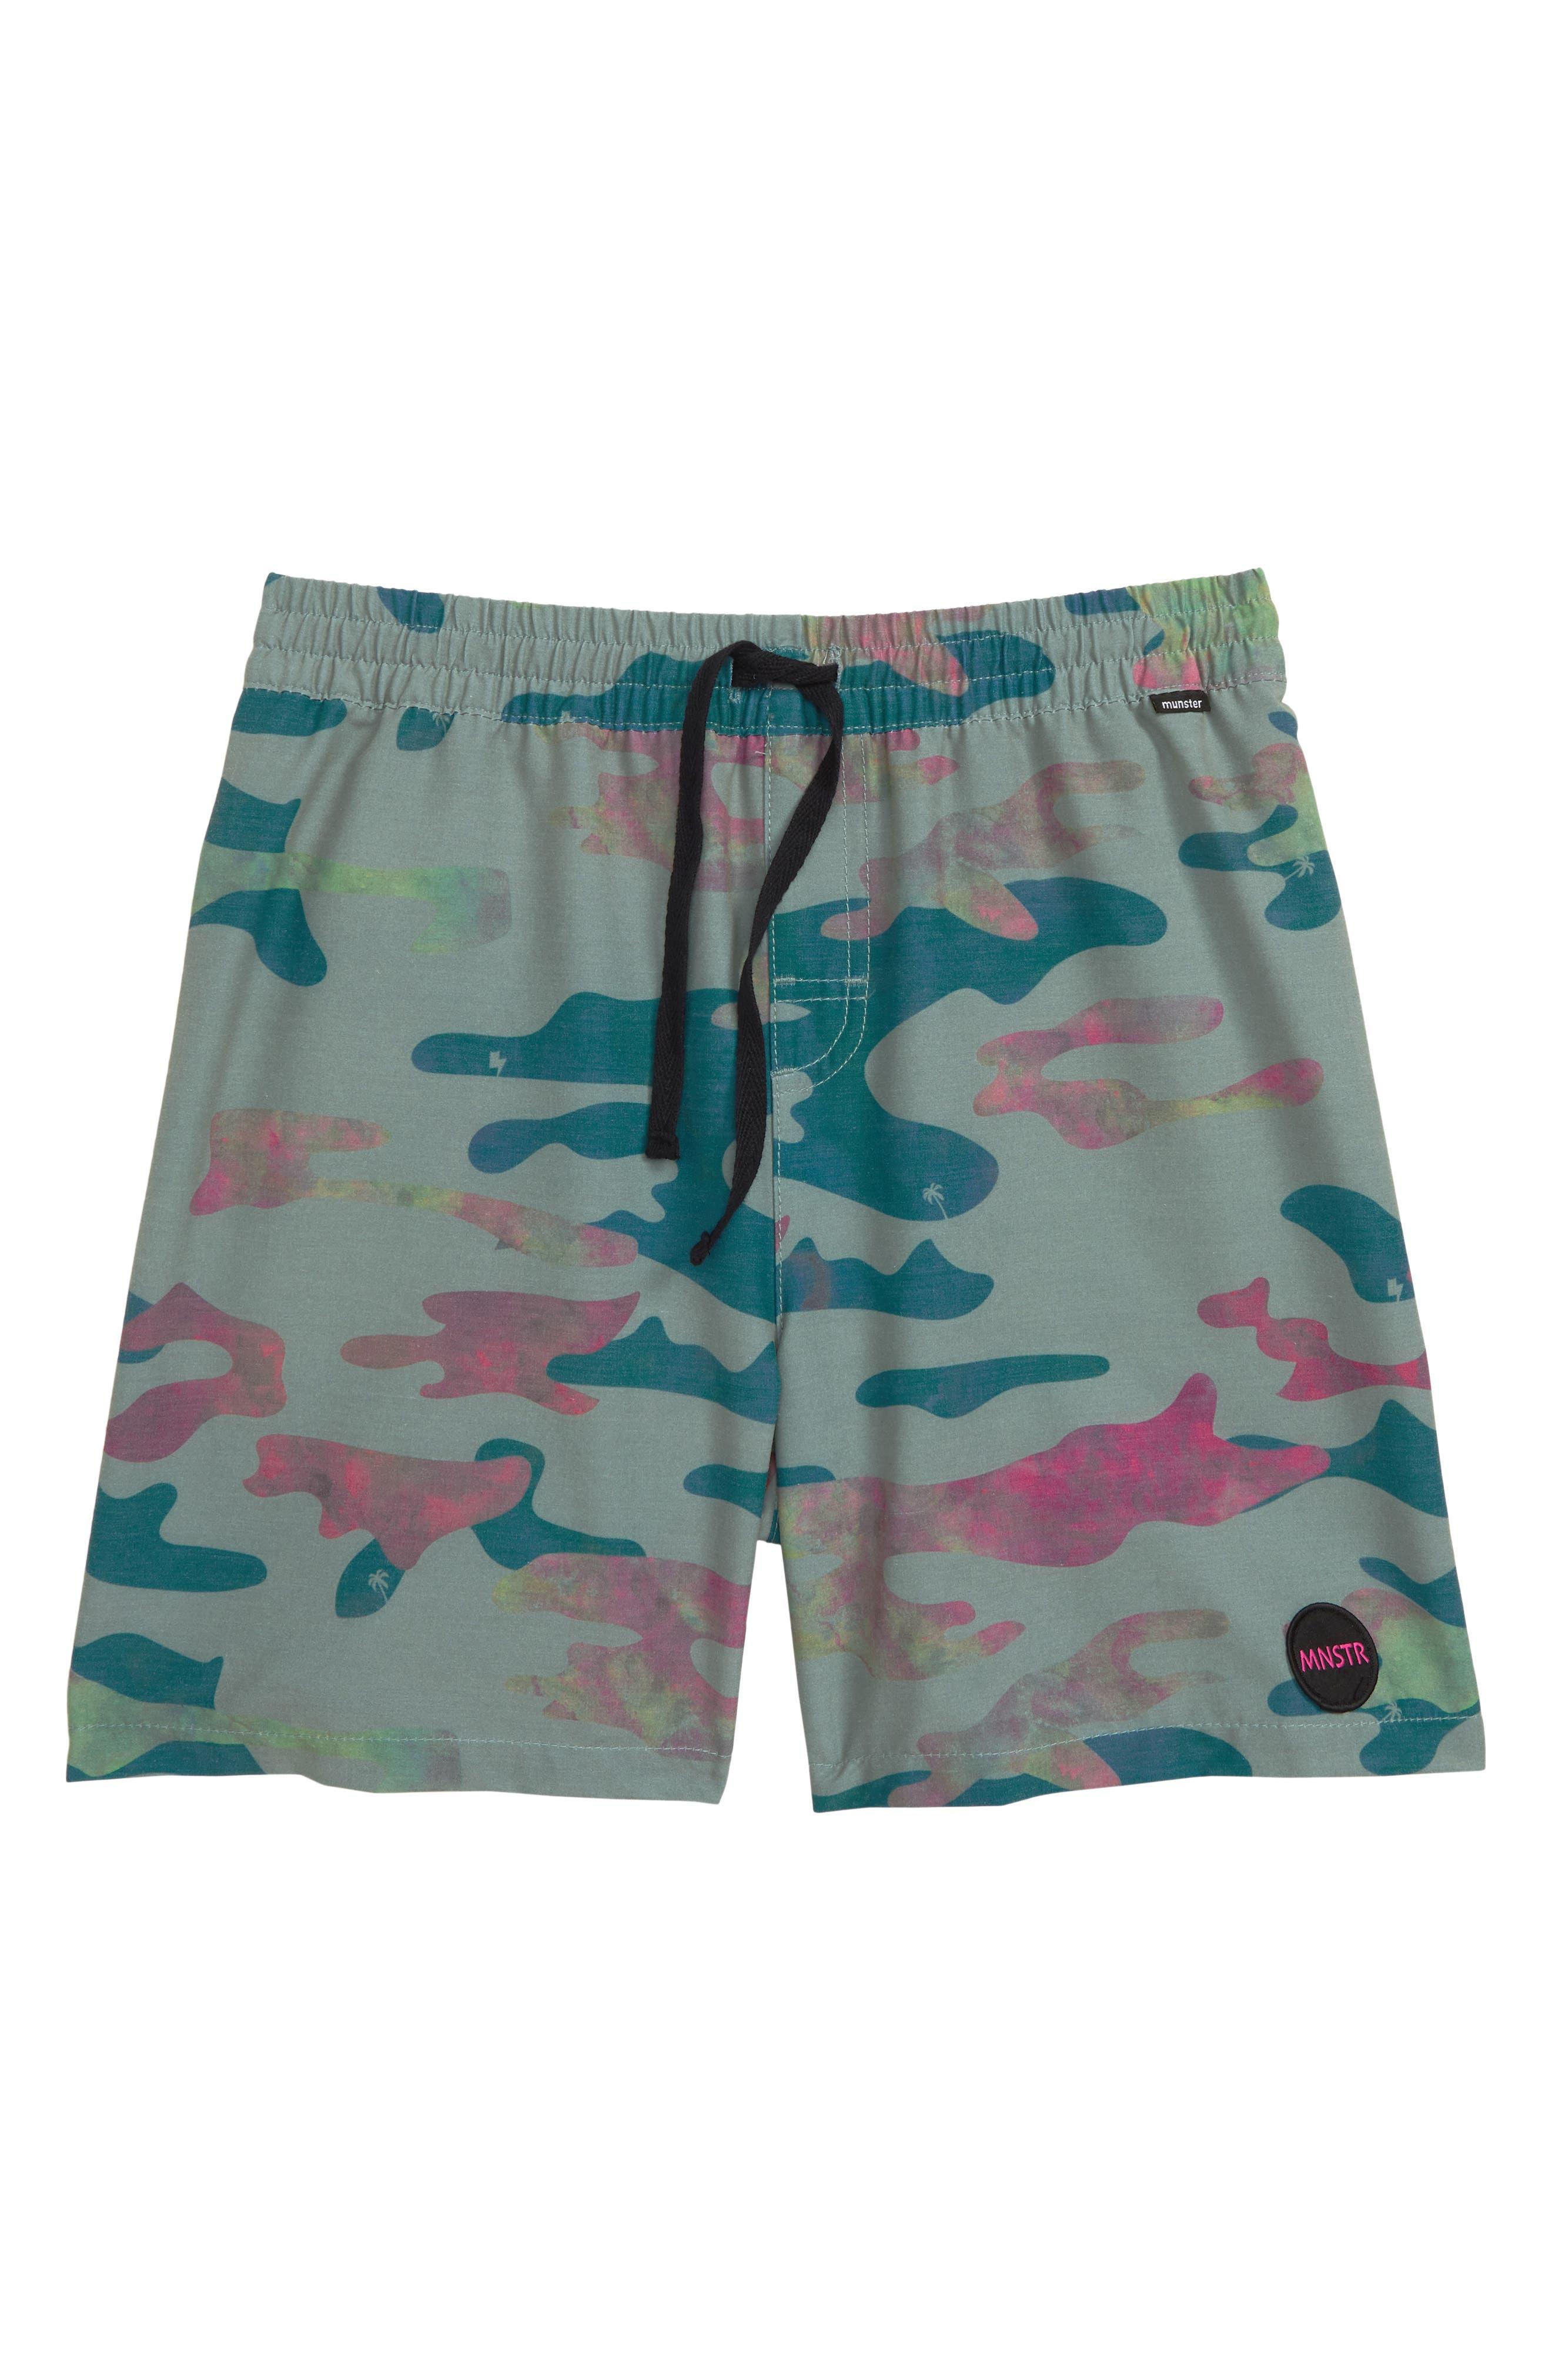 MUNSTERKIDS, Wamo Camo Knit Shorts, Main thumbnail 1, color, CAMO